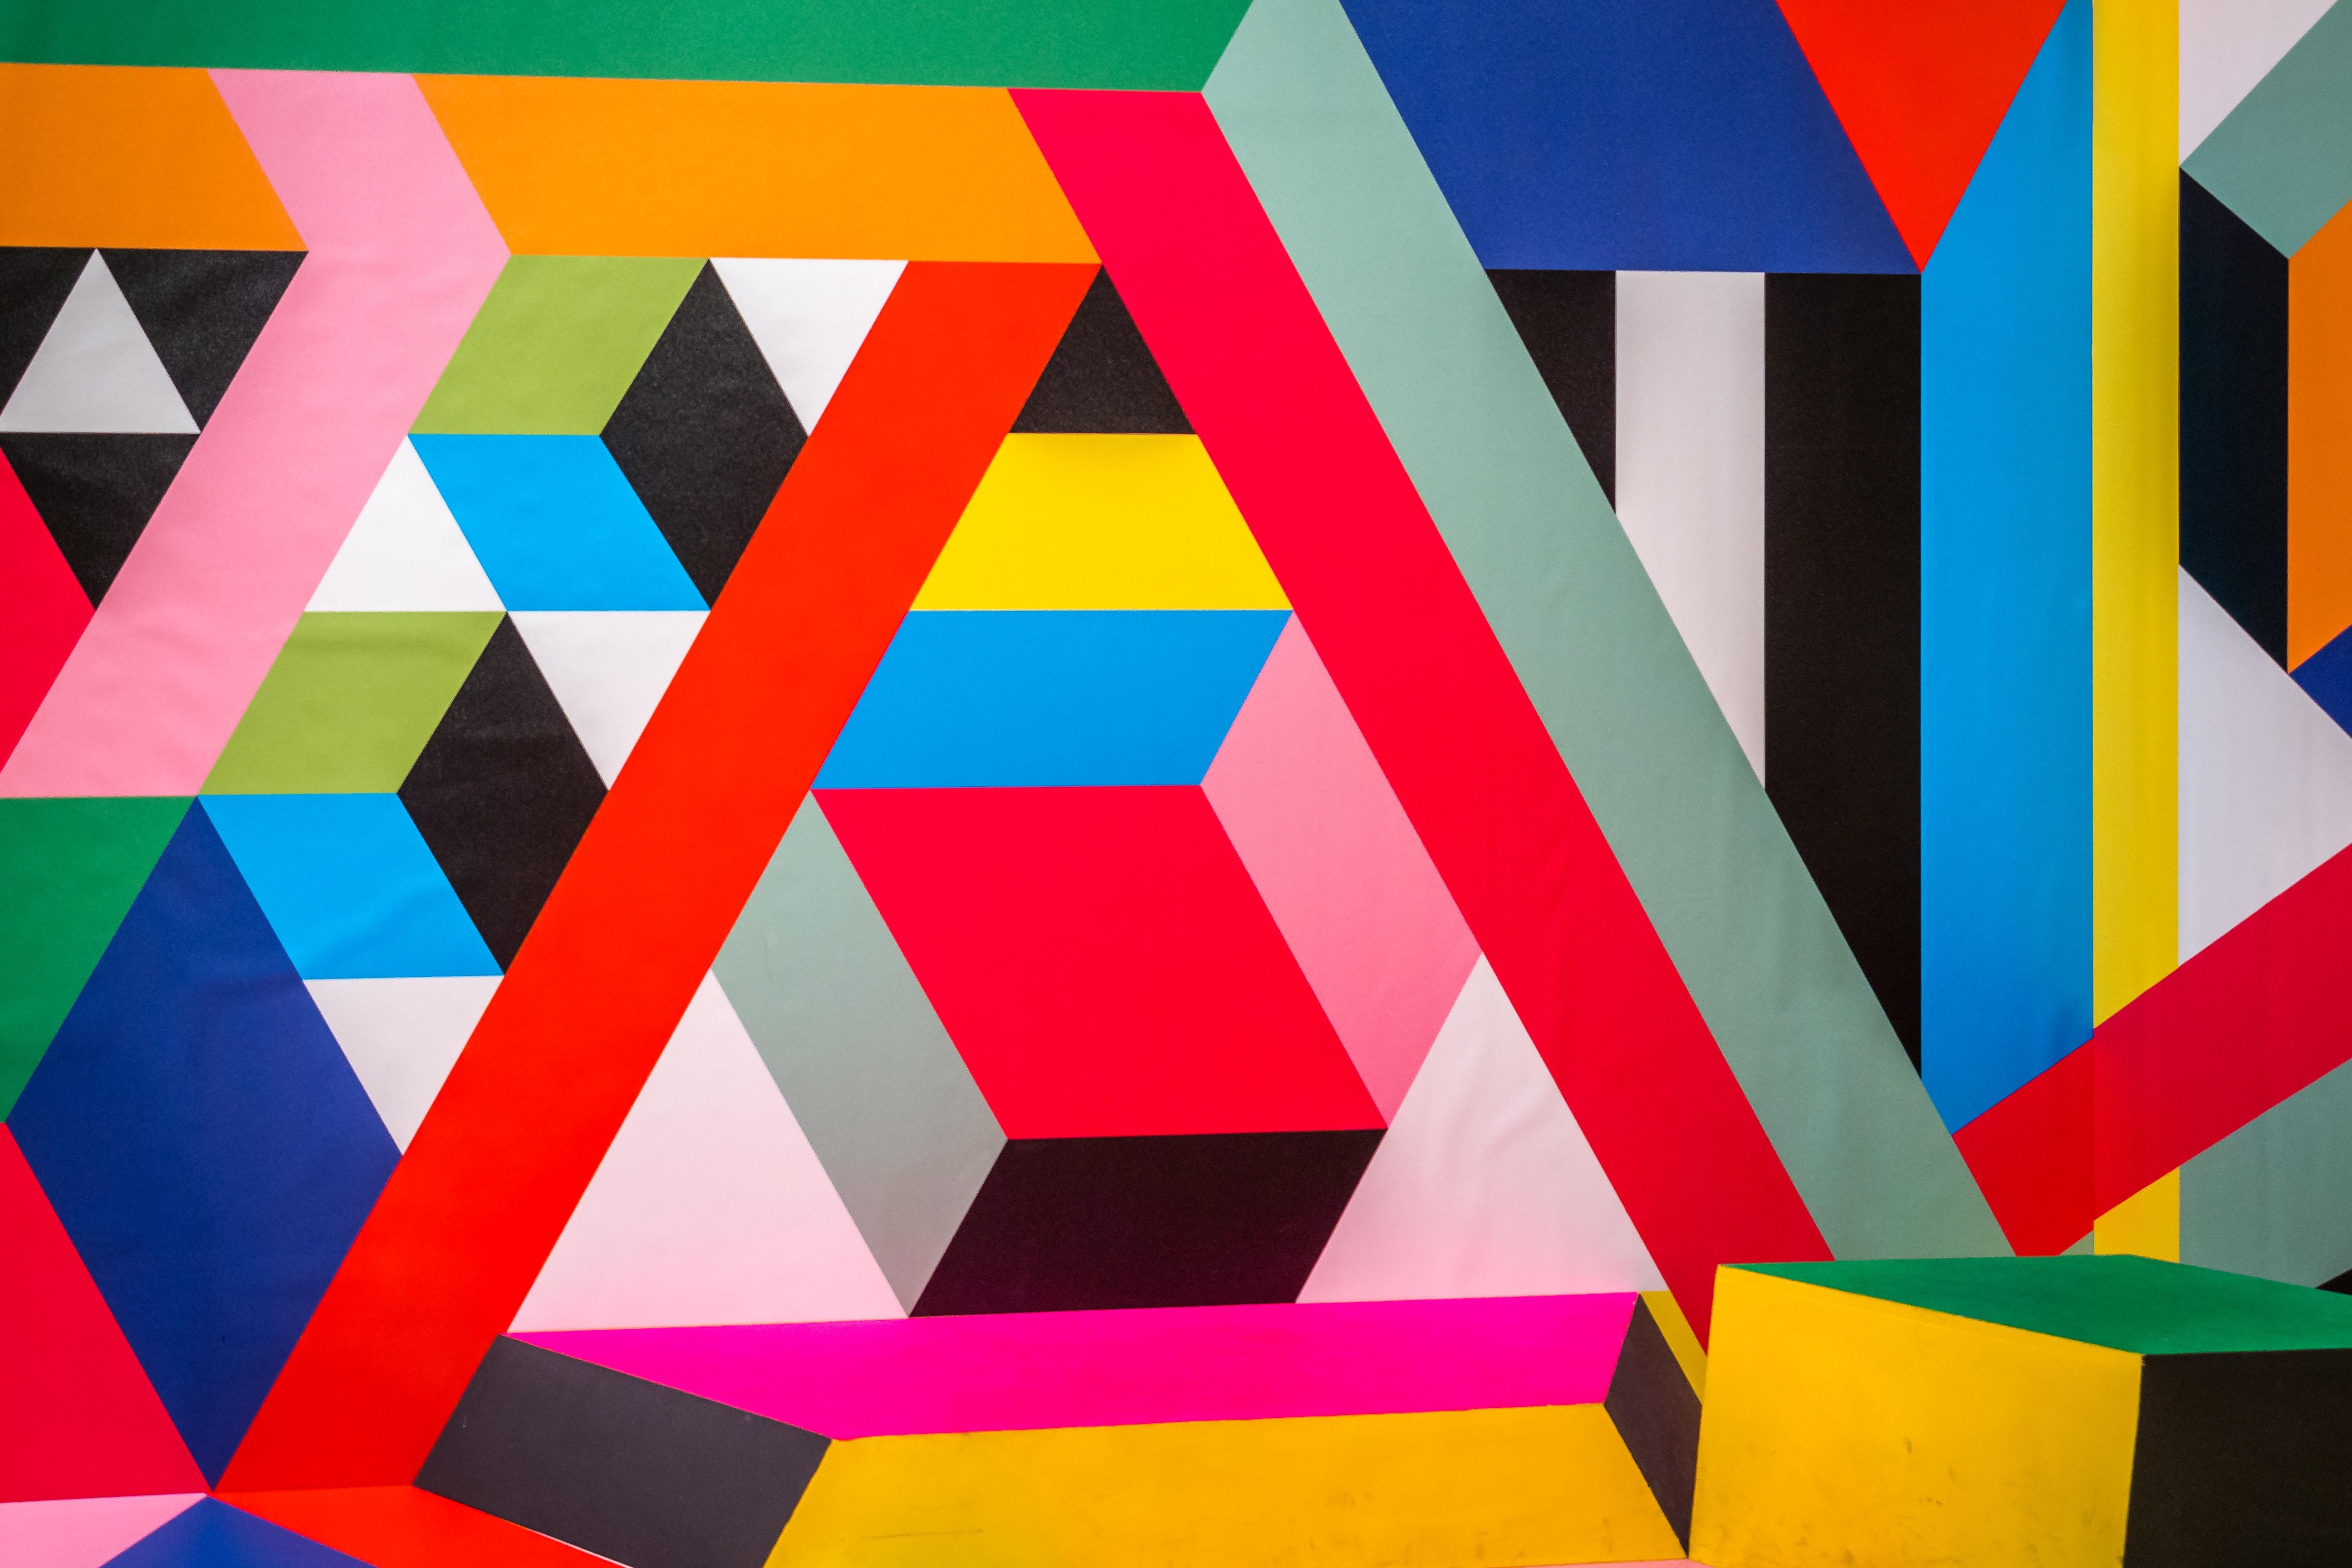 Wallpaper Pattern, Geometric, Colorful, Lines, Shapes, - Geometric Colourful Shapes Background - HD Wallpaper